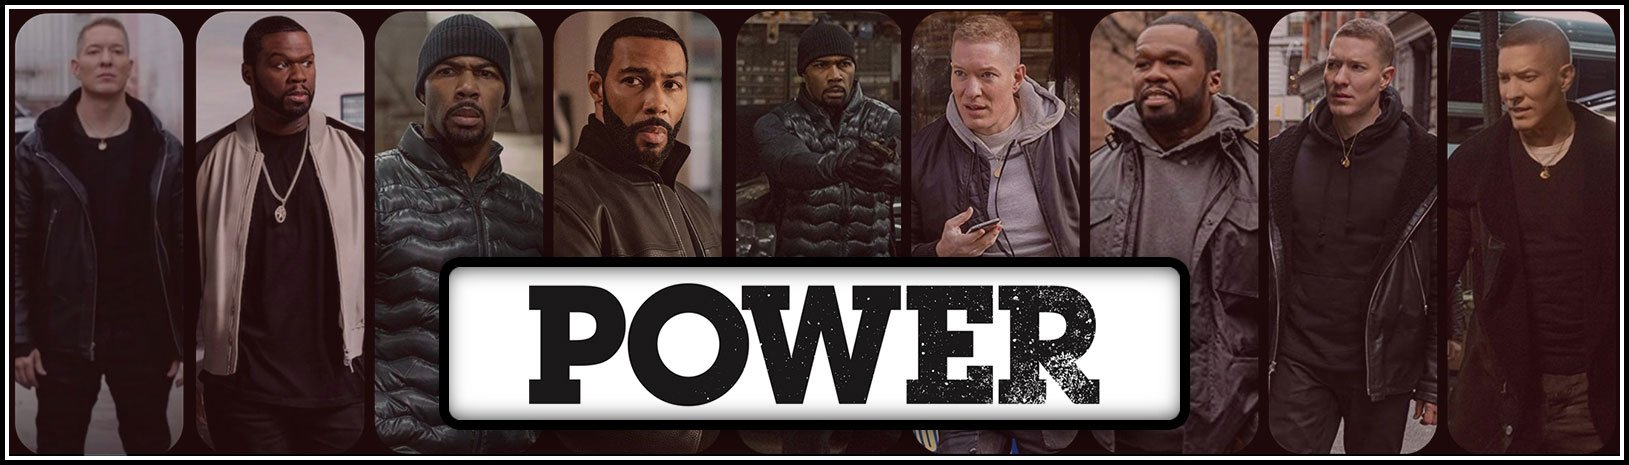 Power Jackets And Coats